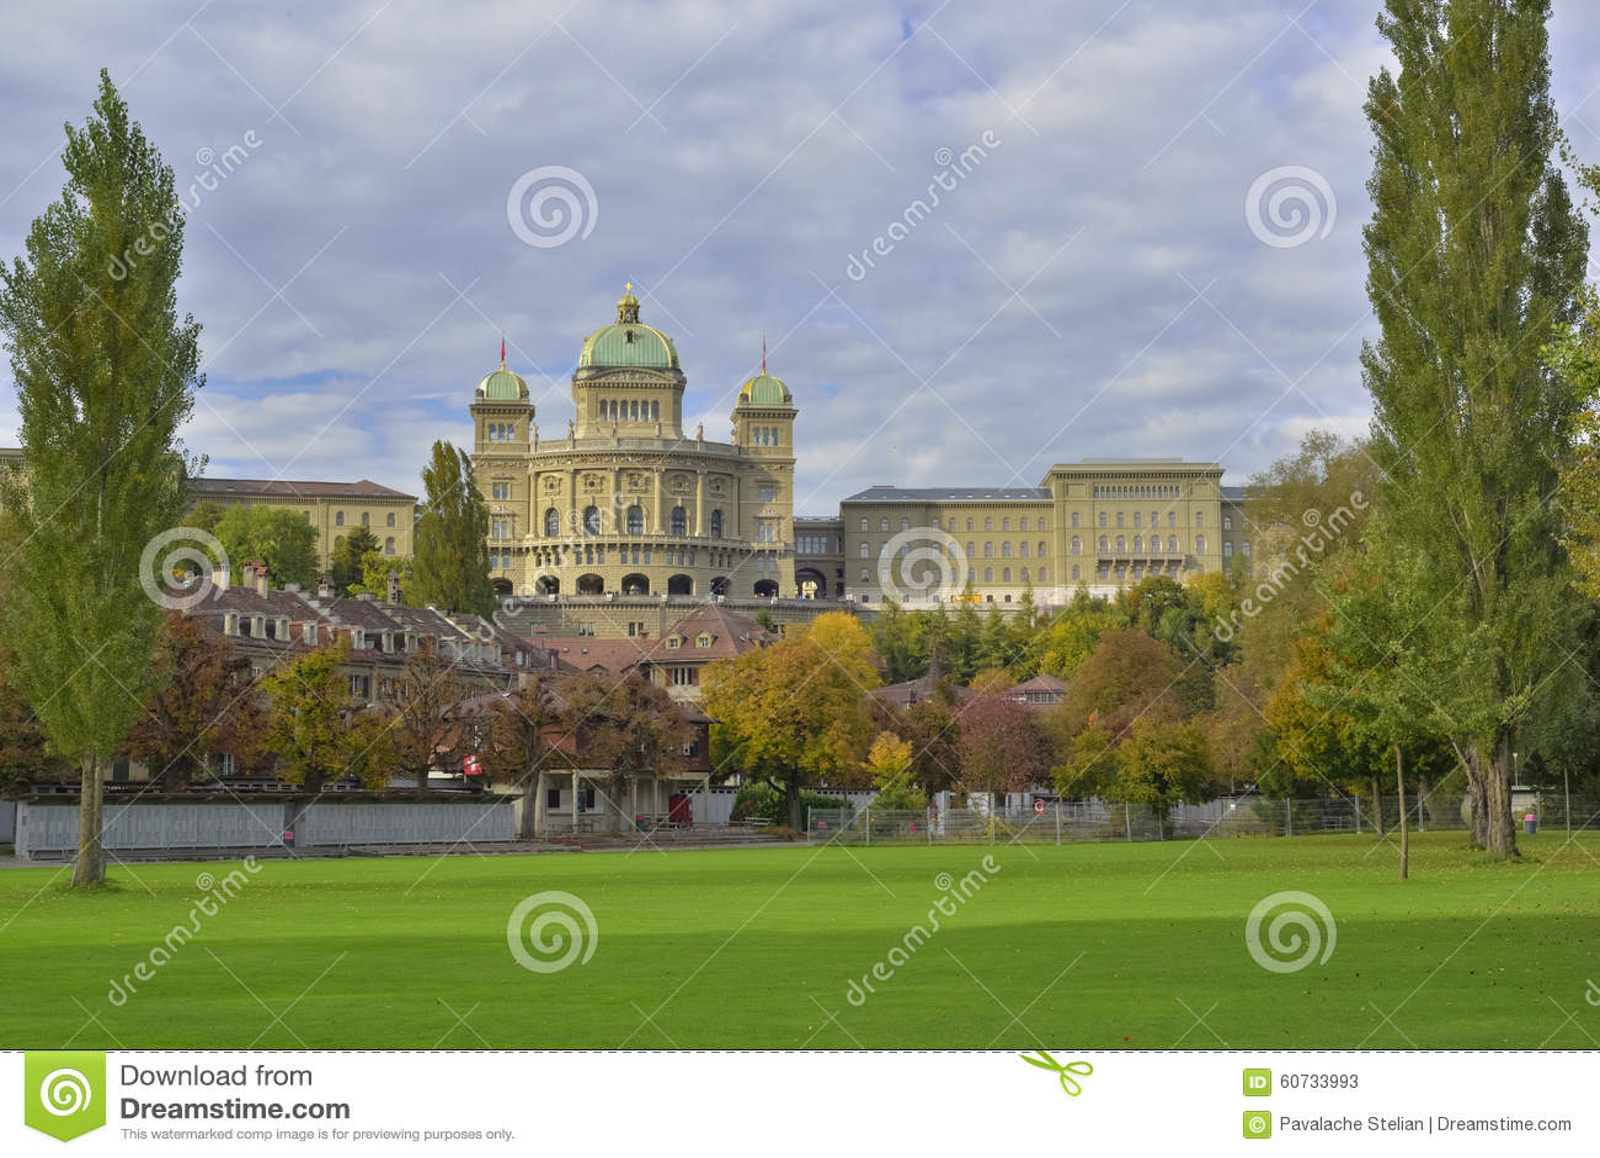 BundesHause (Switzerland parliament) from Freibad Marzili. Bern. Switzerland